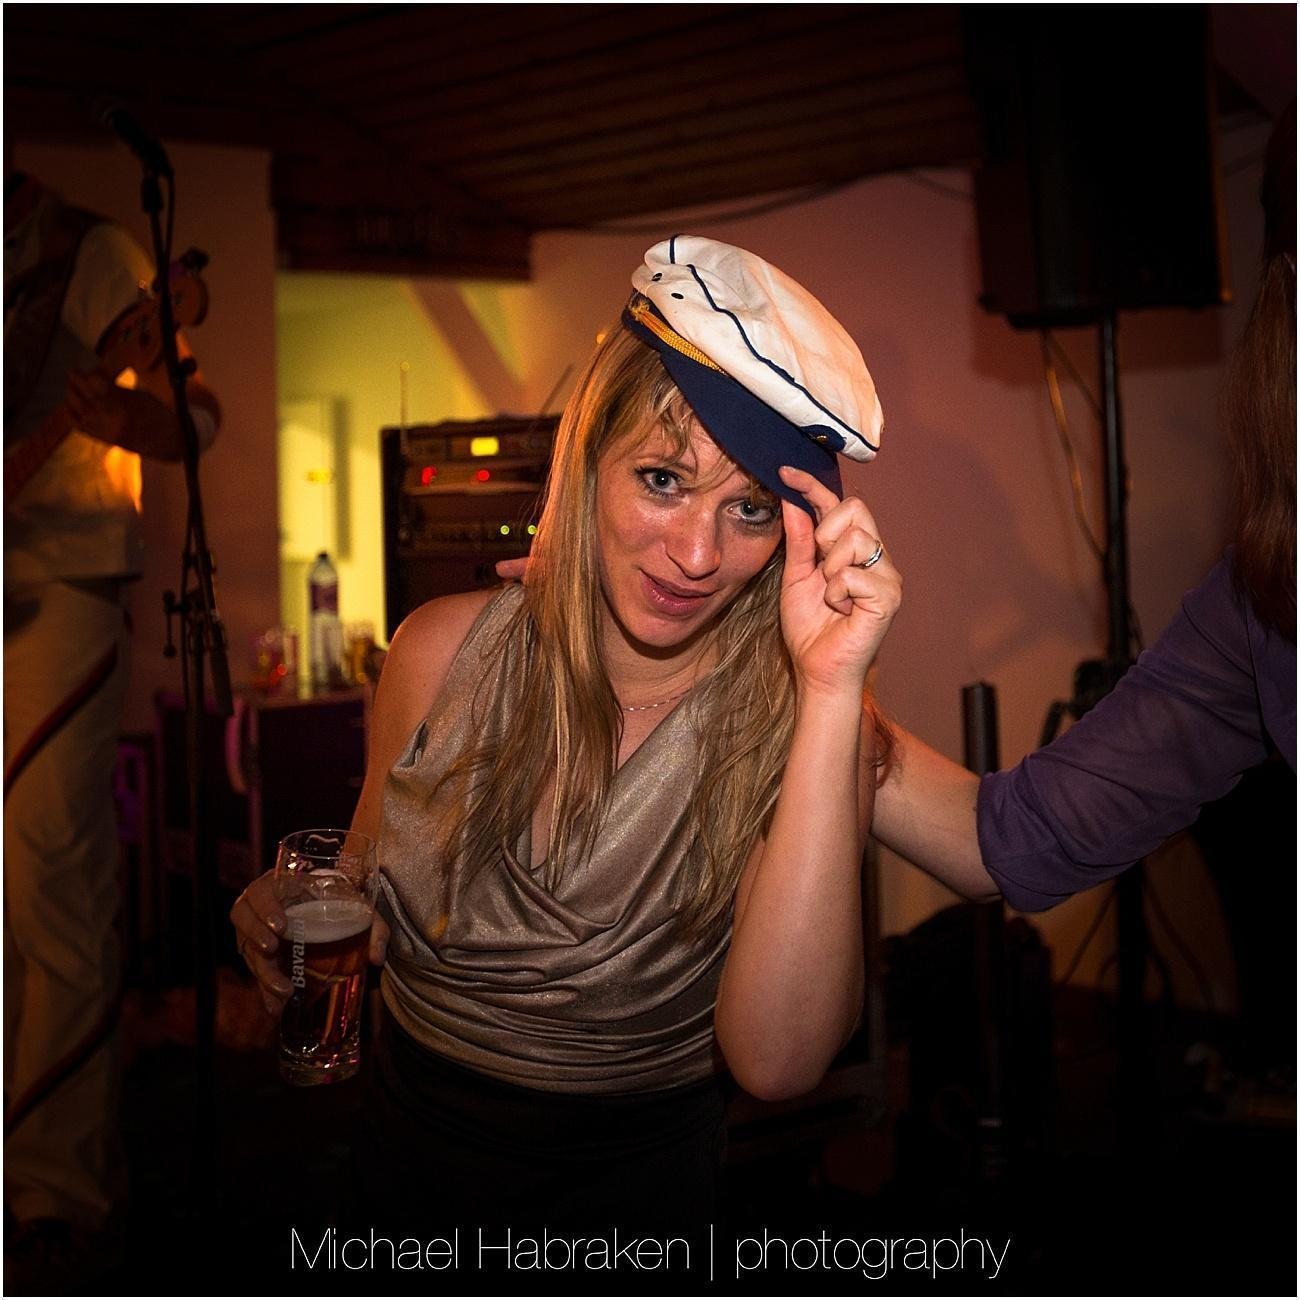 MichaelHabraken|photography_0651.jpg